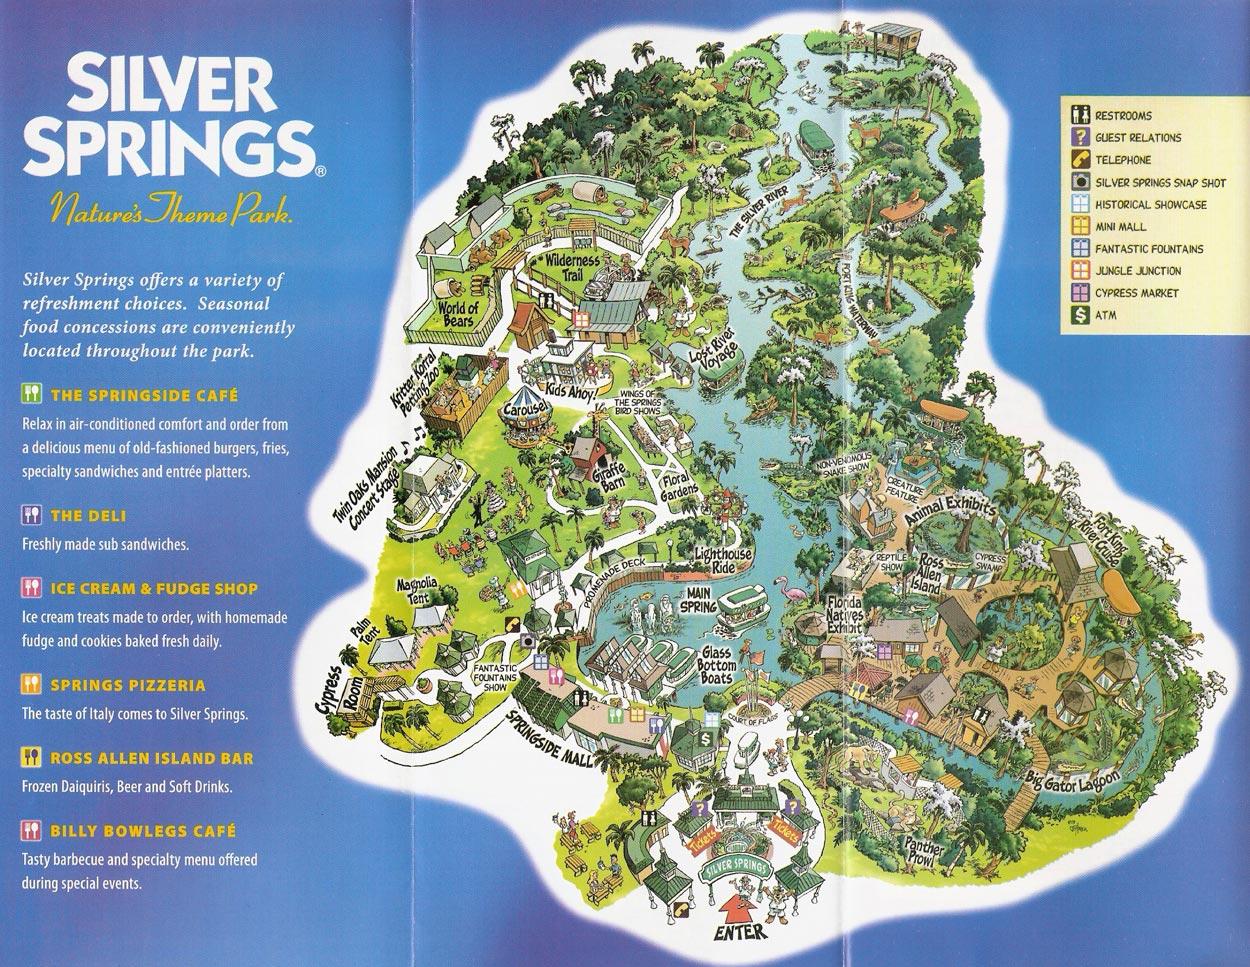 Theme Park Brochures Silver Springs - Theme Park Brochures - Silver Springs Florida Map